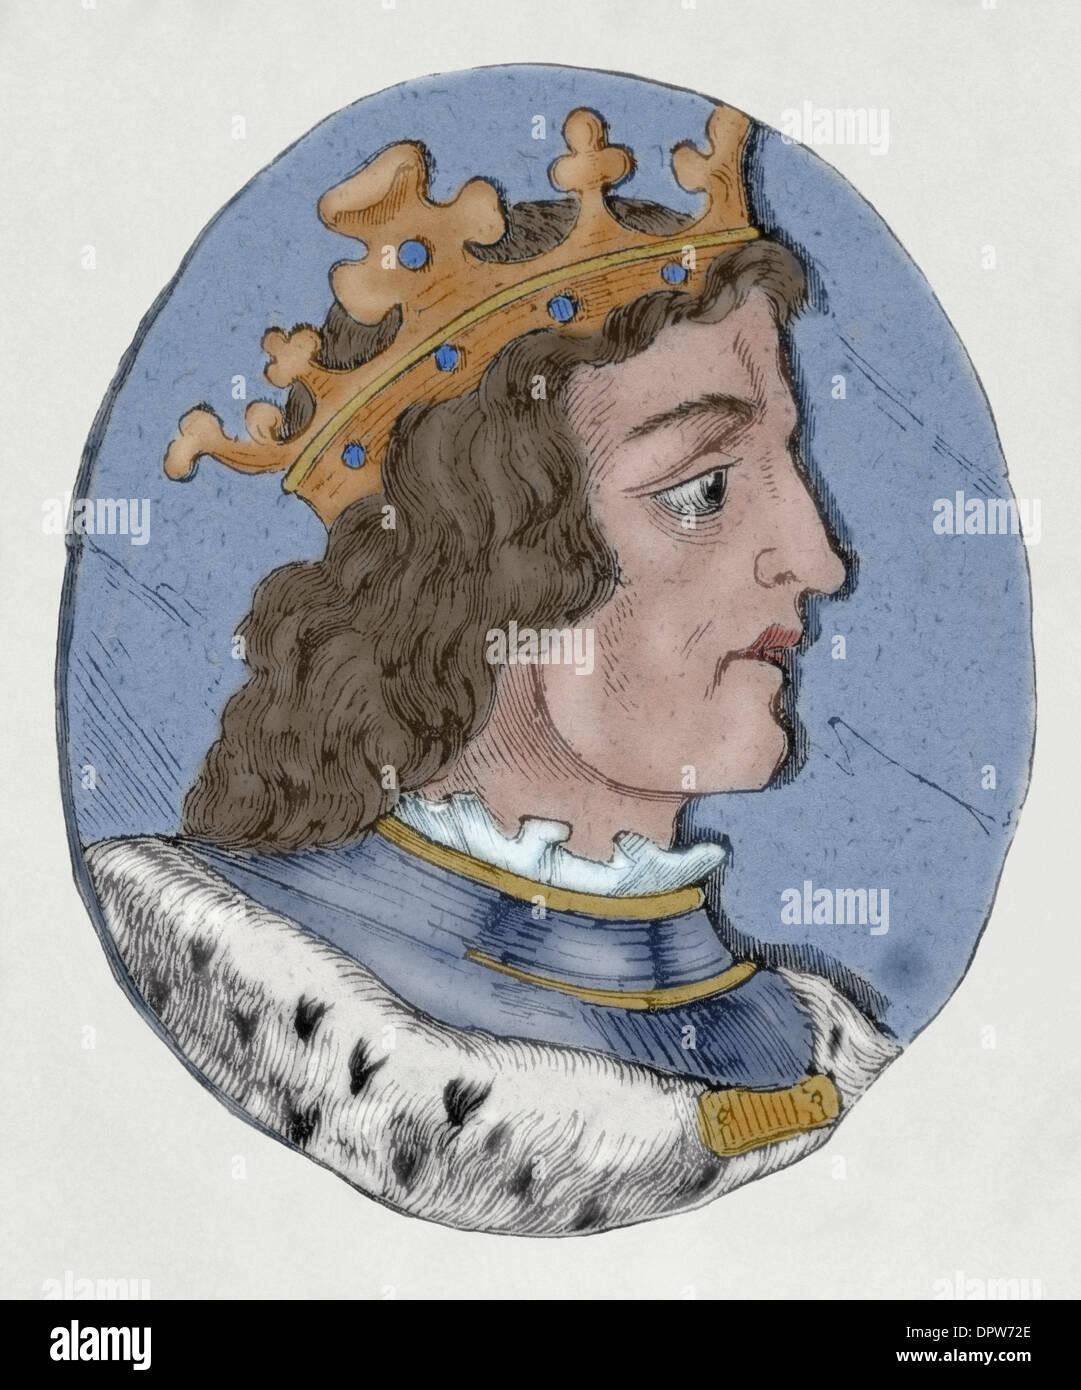 Ramiro III (961-985), roi de León (966-984). La gravure. De couleur. Photo Stock